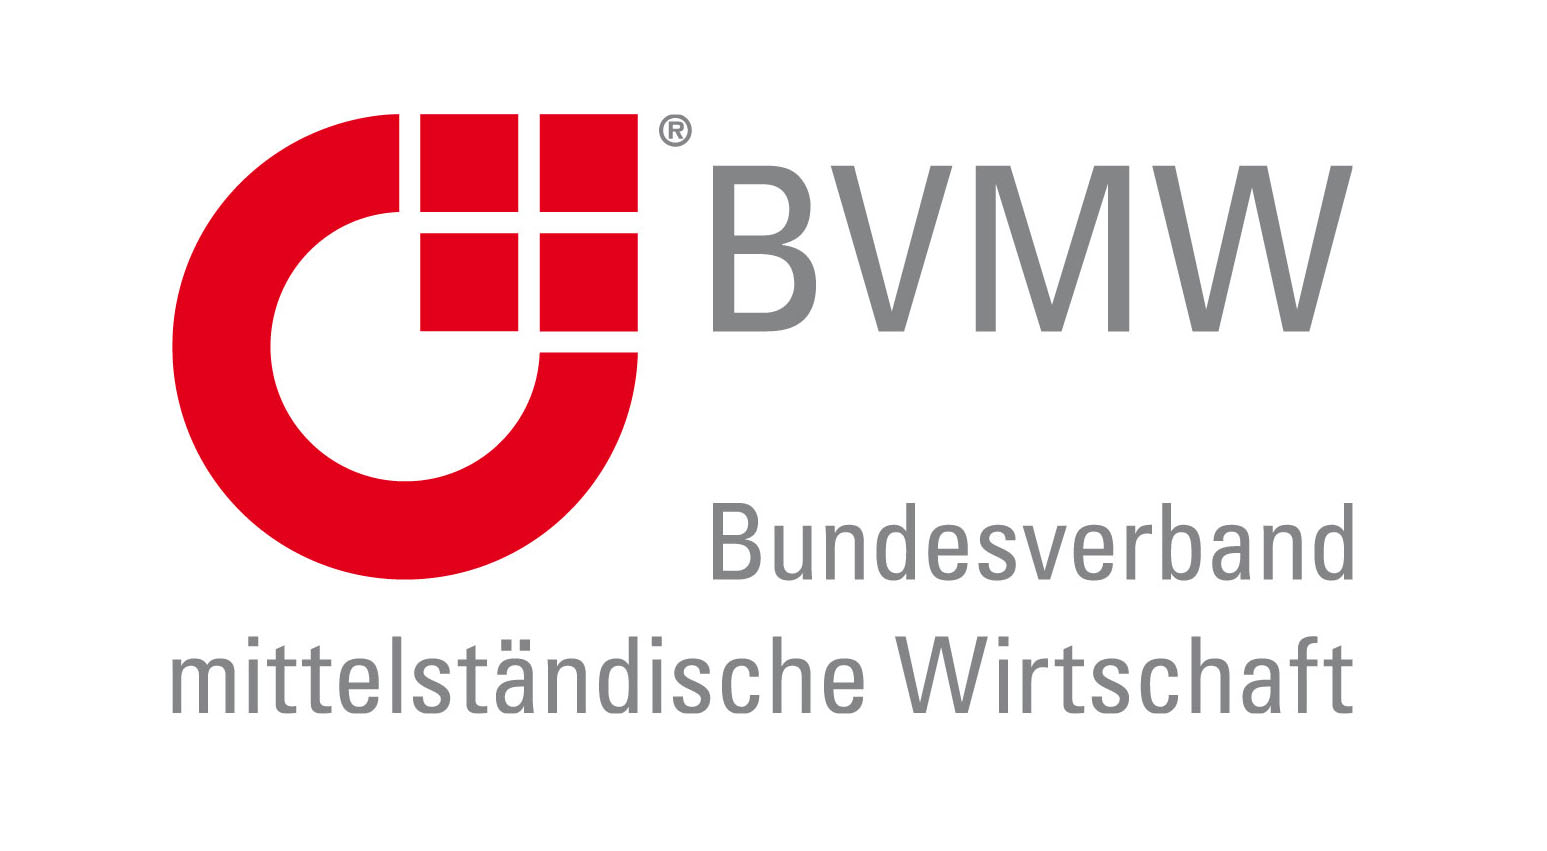 Energiekommission_BVMW_QUNDIS_Mitglied